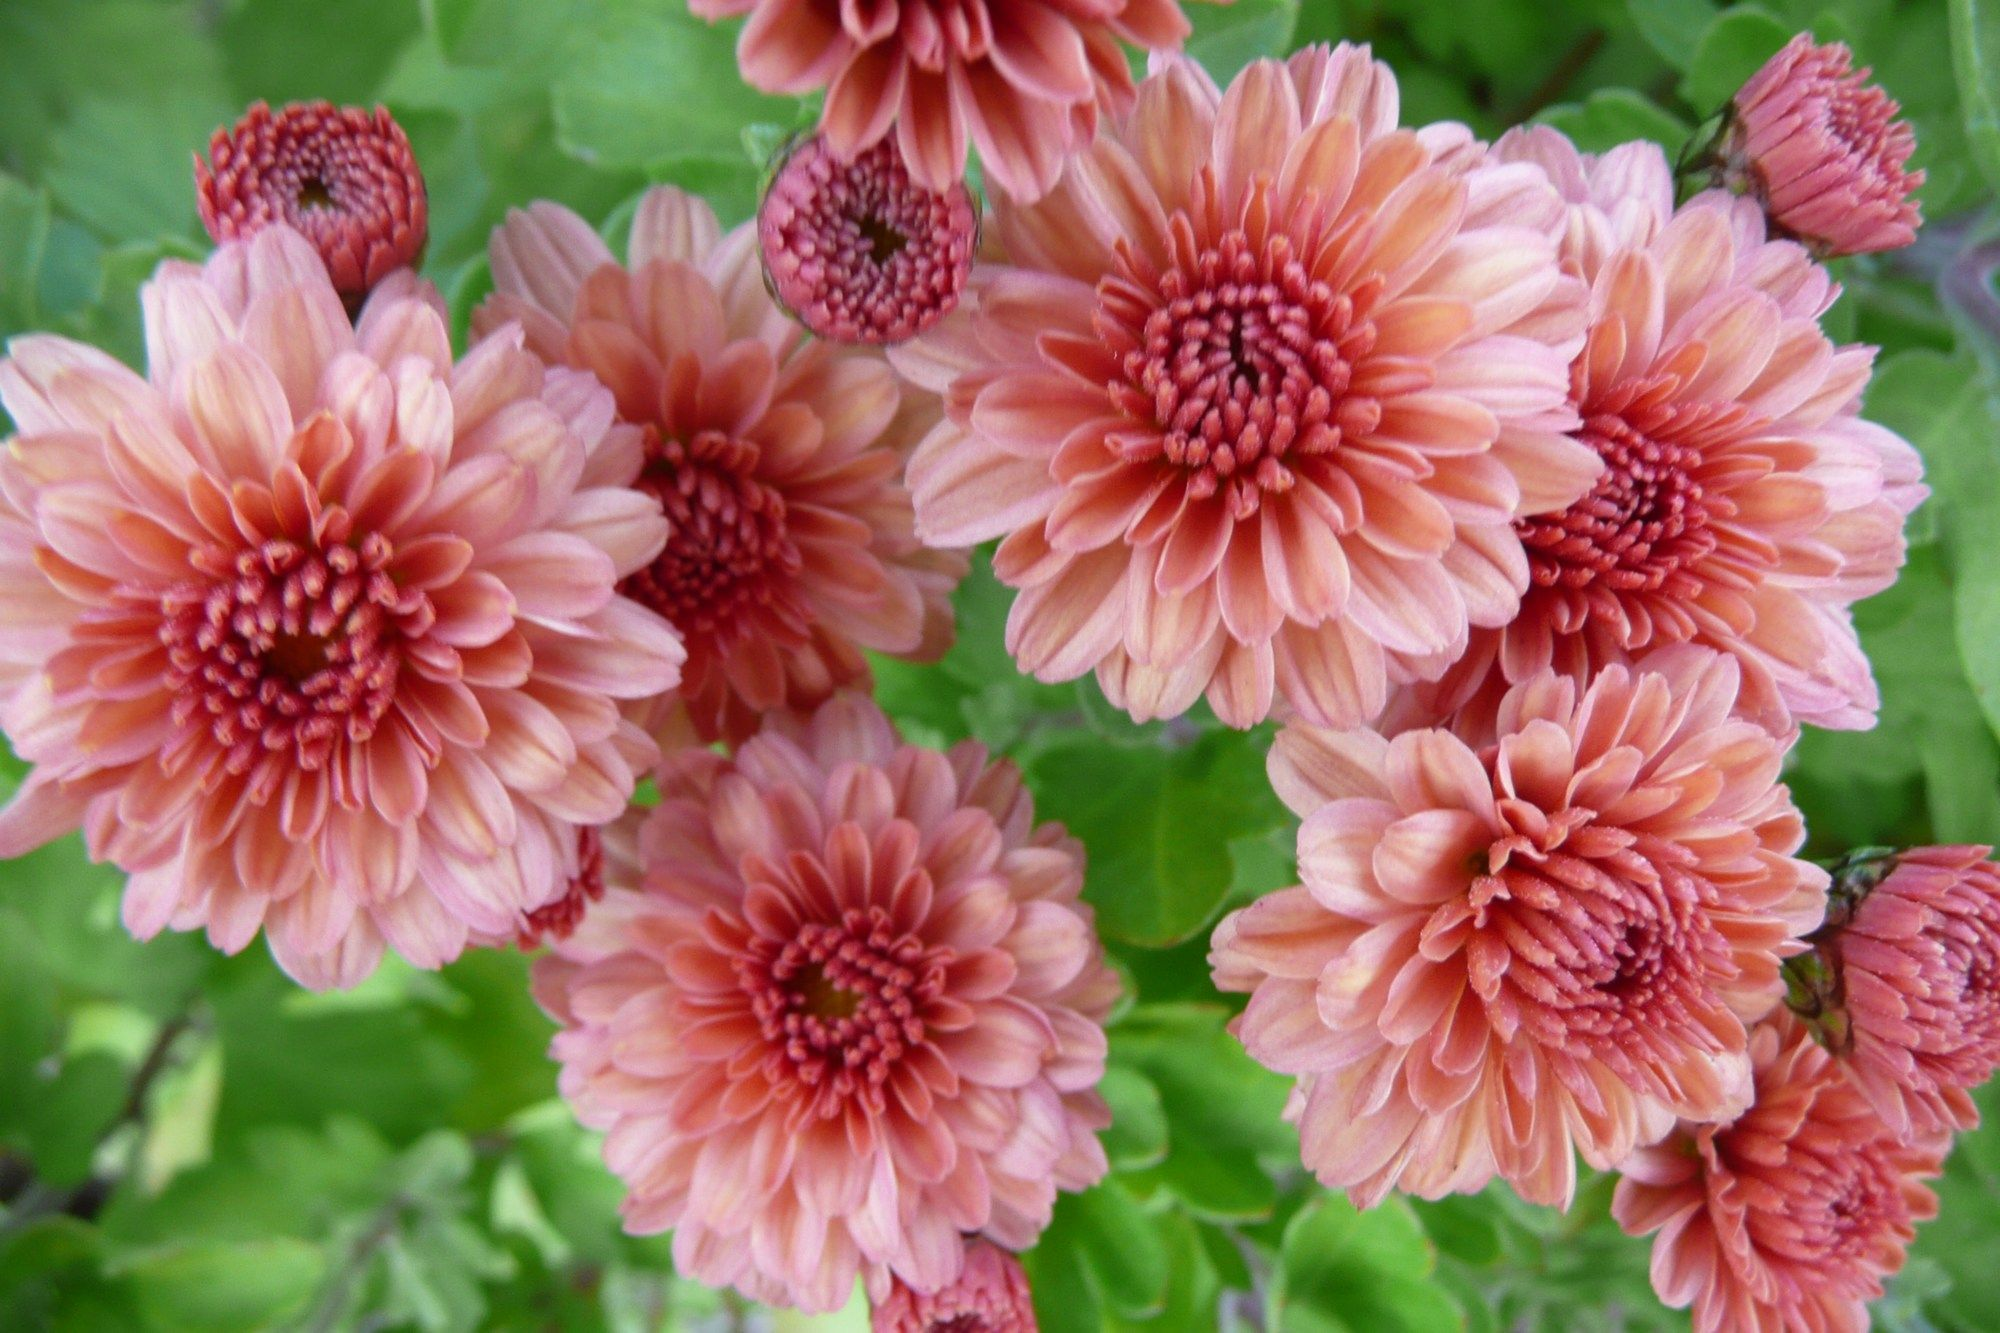 Chrysanthemum Flat Mums Flat Poms Spray Mums Flower Identification